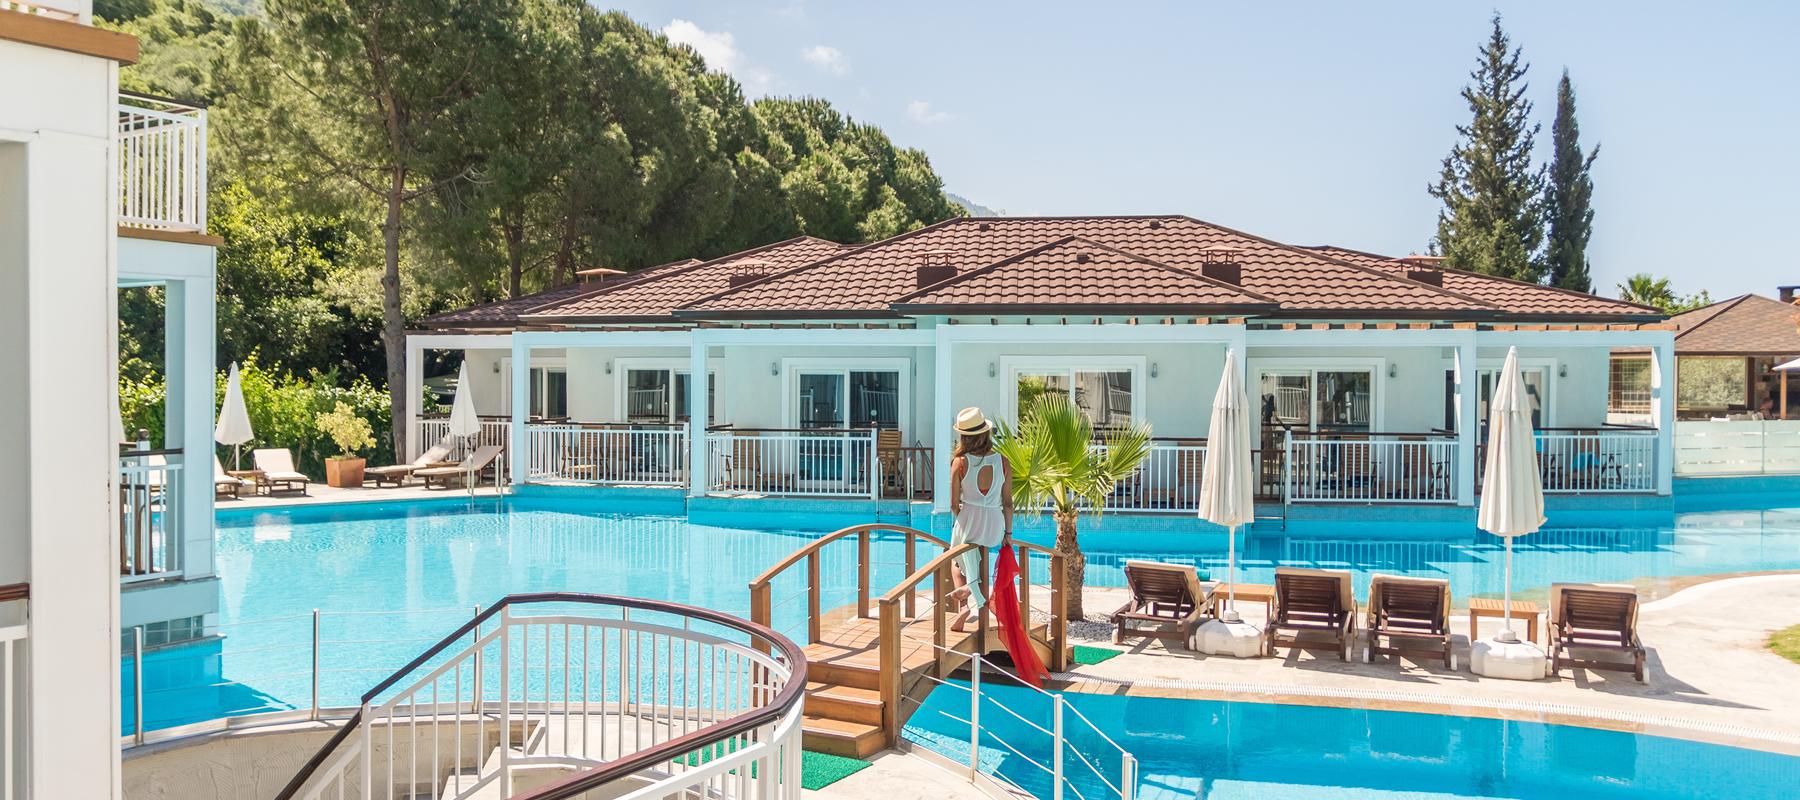 Oludeniz Mozaik Apartments And Swim Up Boutique Hotel Rooms Luxury Self Catering In Olu Deniz Fethiye Turkey